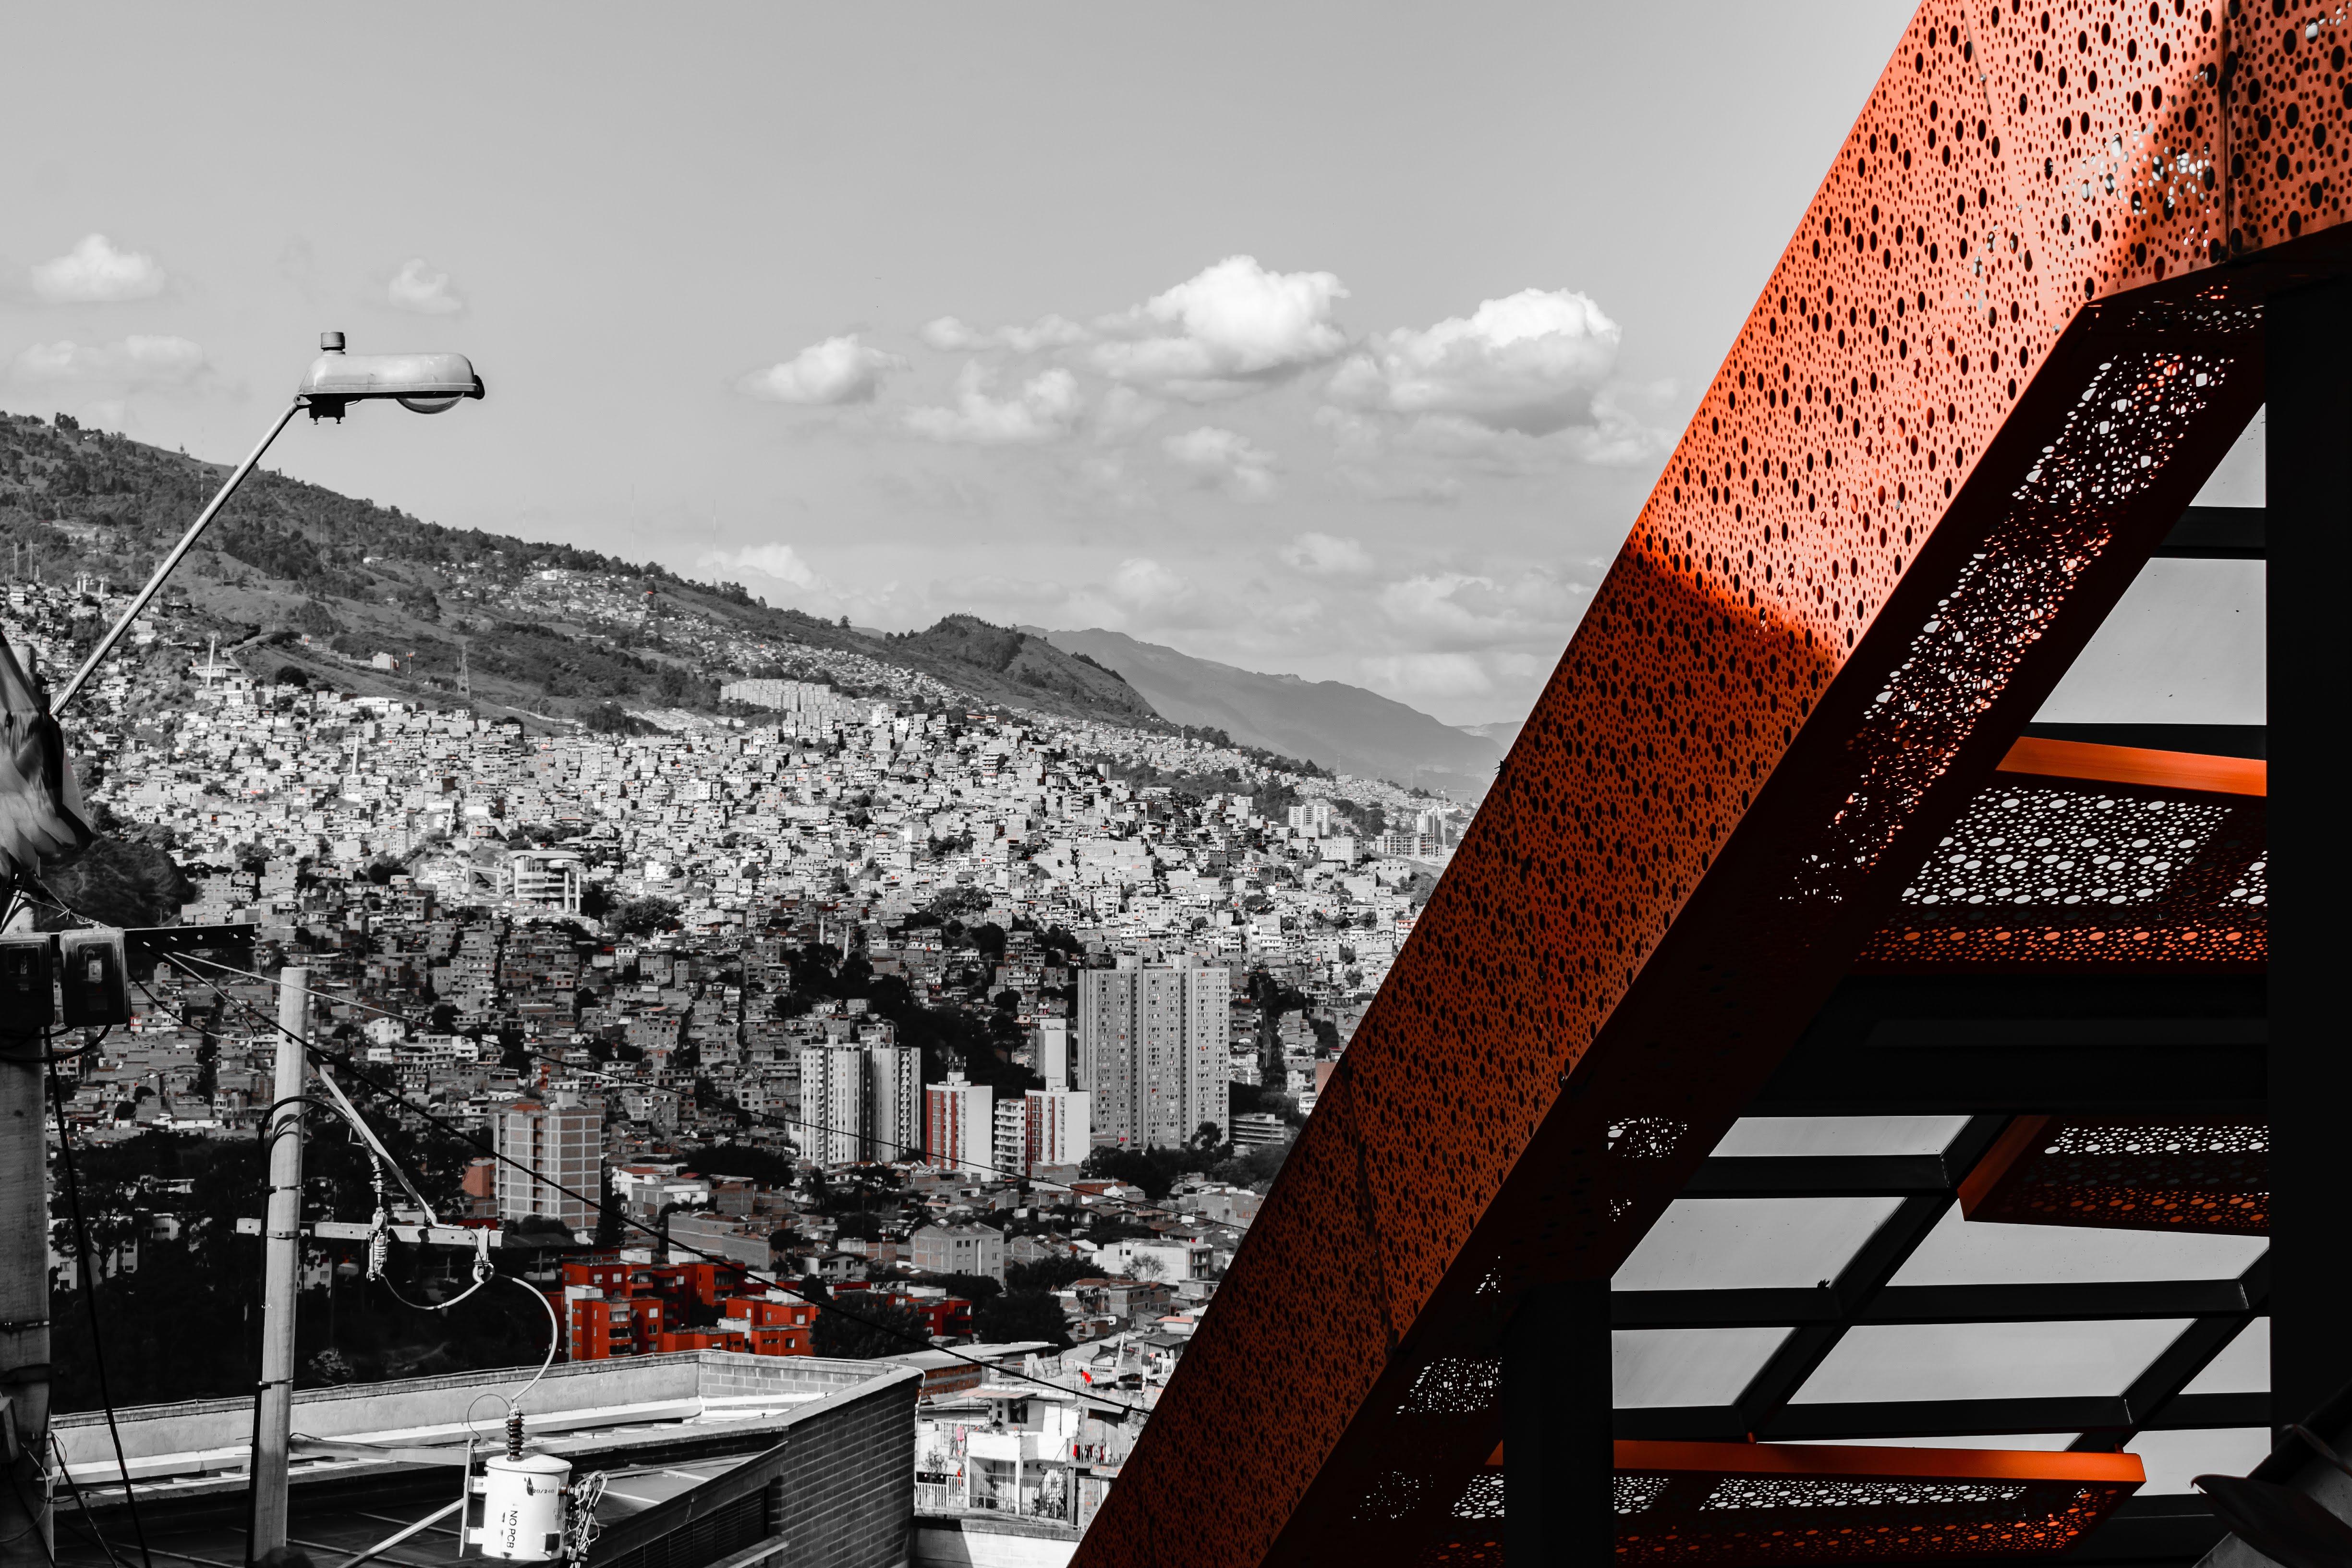 Community 13, Medellin Colombia